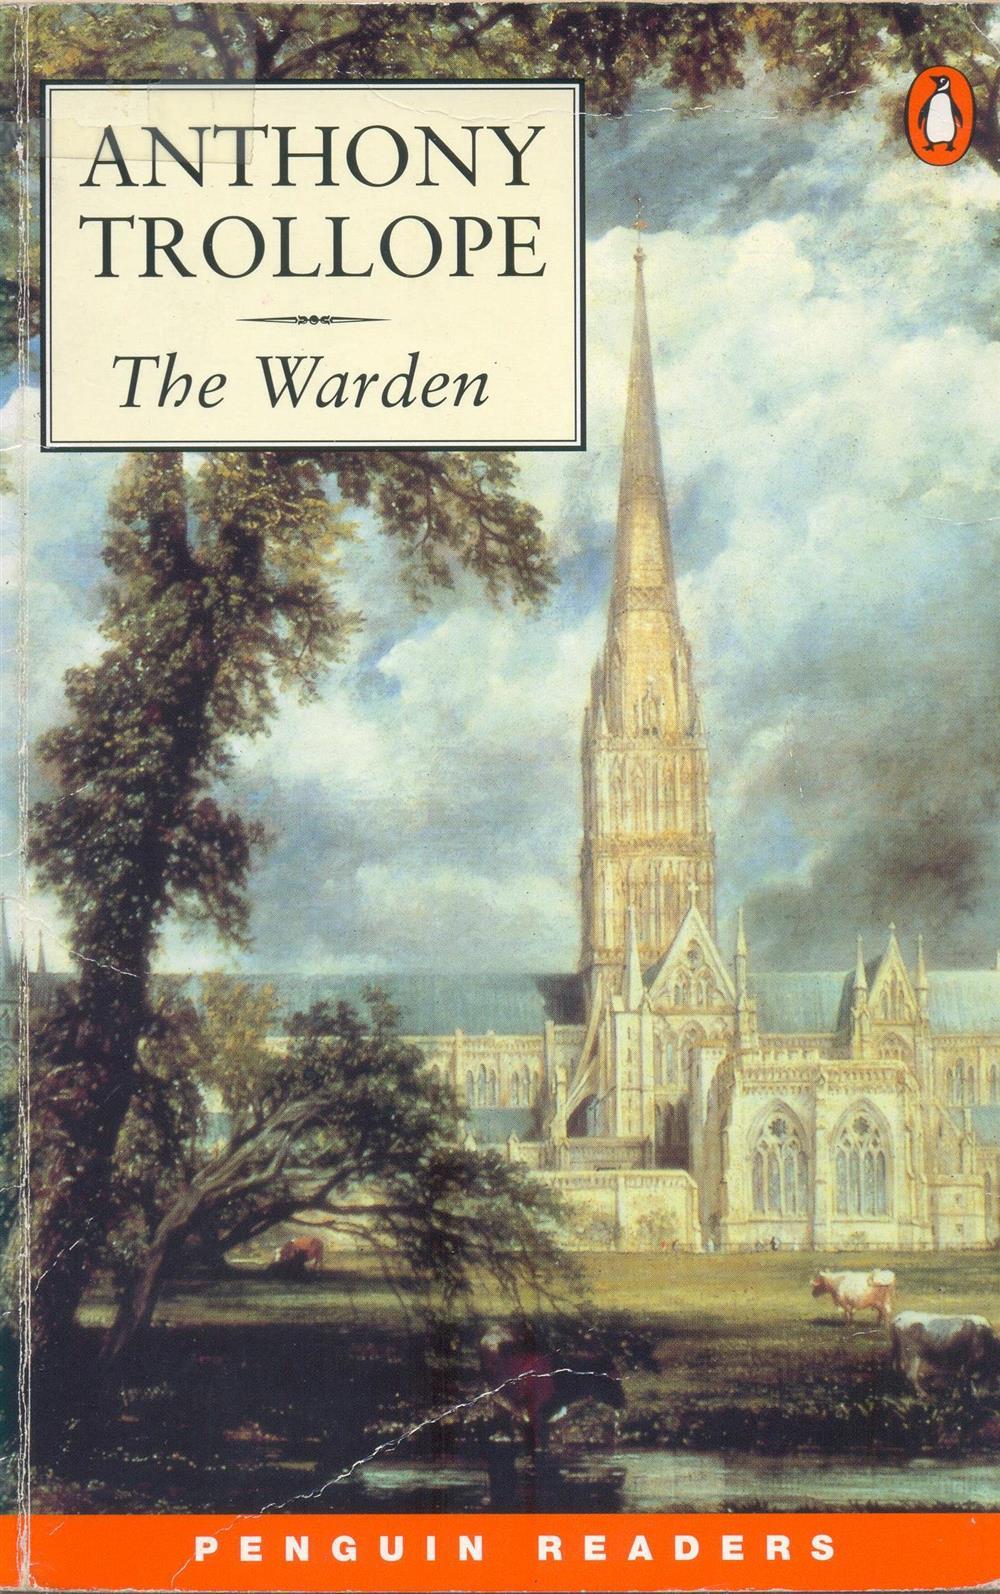 The warden 001.jpg